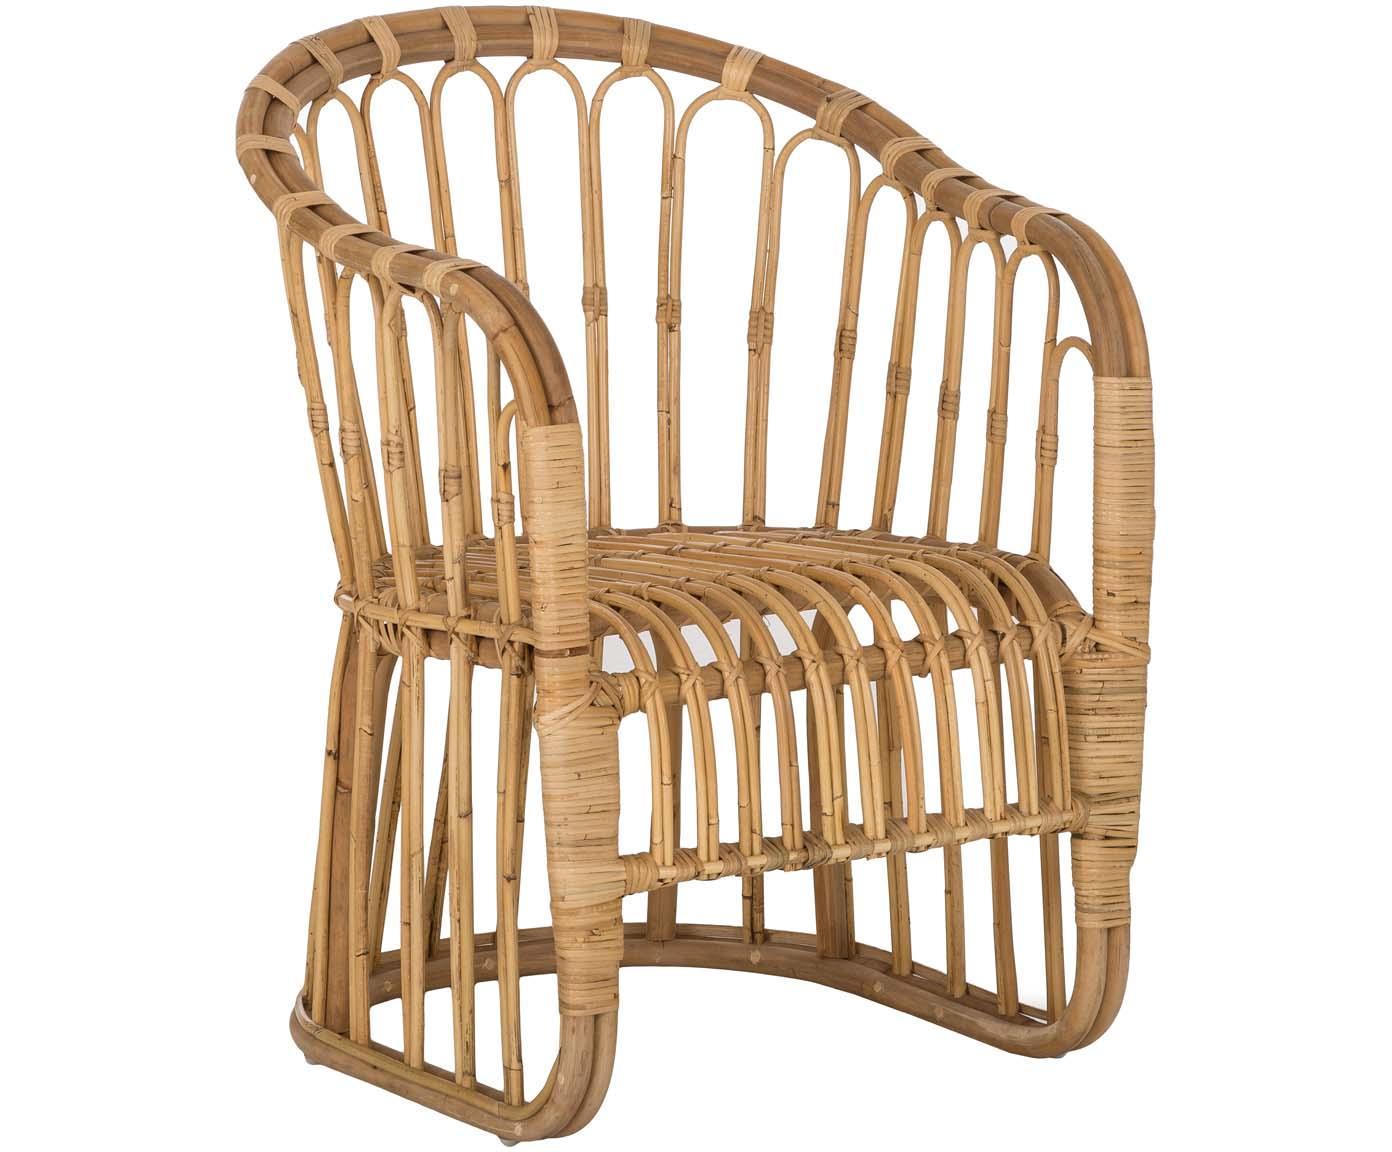 Sedia con braccioli in vimini  Palma, Rattan, Rattan, Larg. 60 x Alt. 65 cm